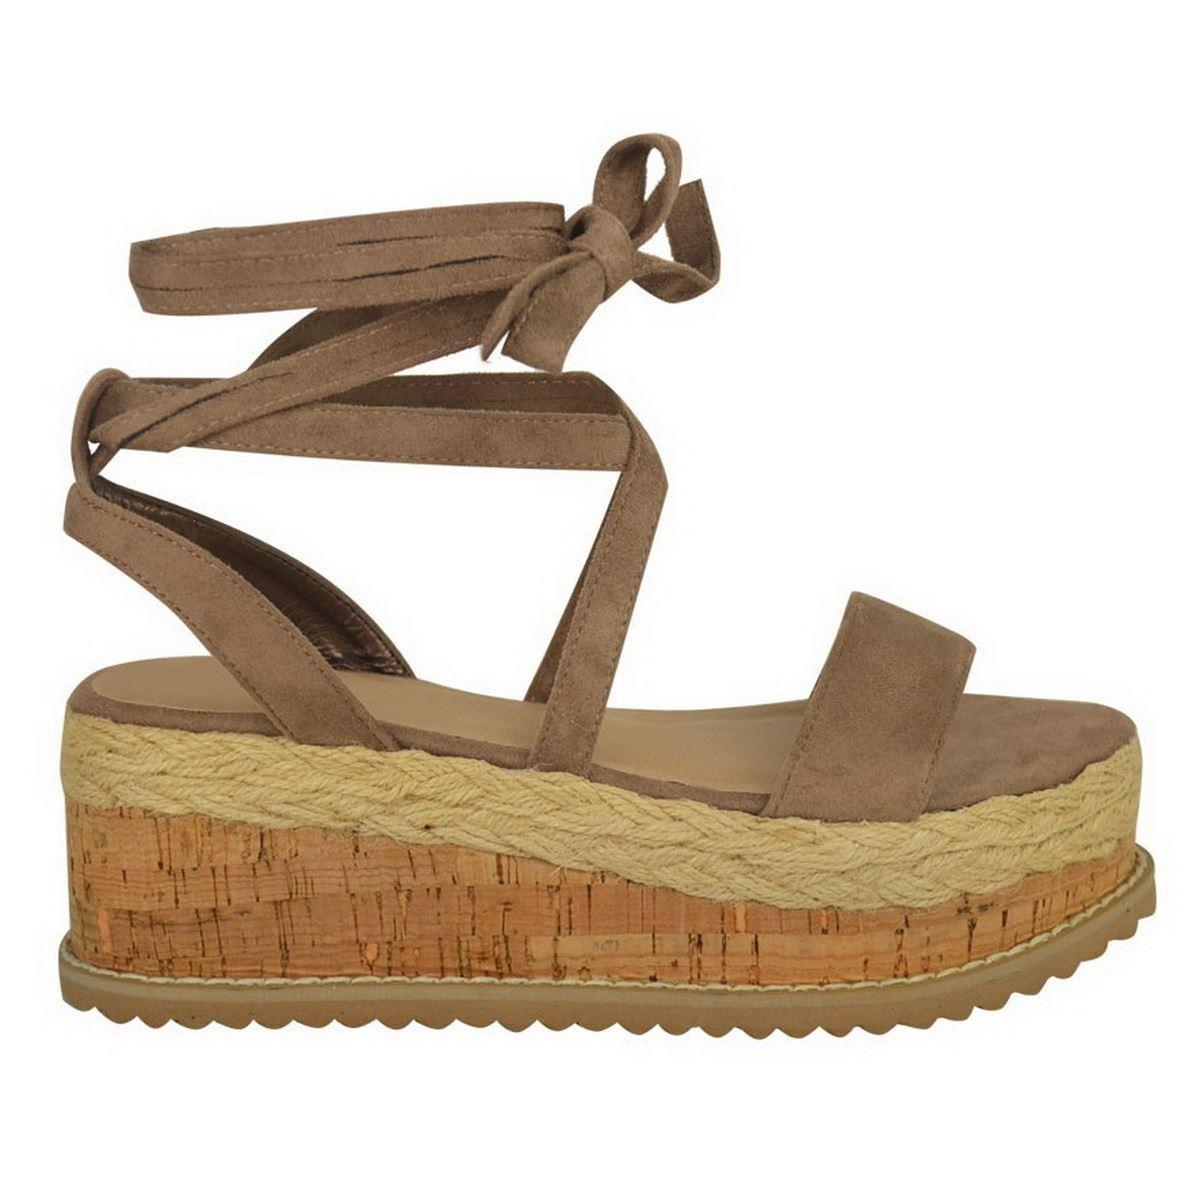 Womens Ladies Flatform Cork Espadrille Sandals Wedge Lace Up Ankle Shoes BL10